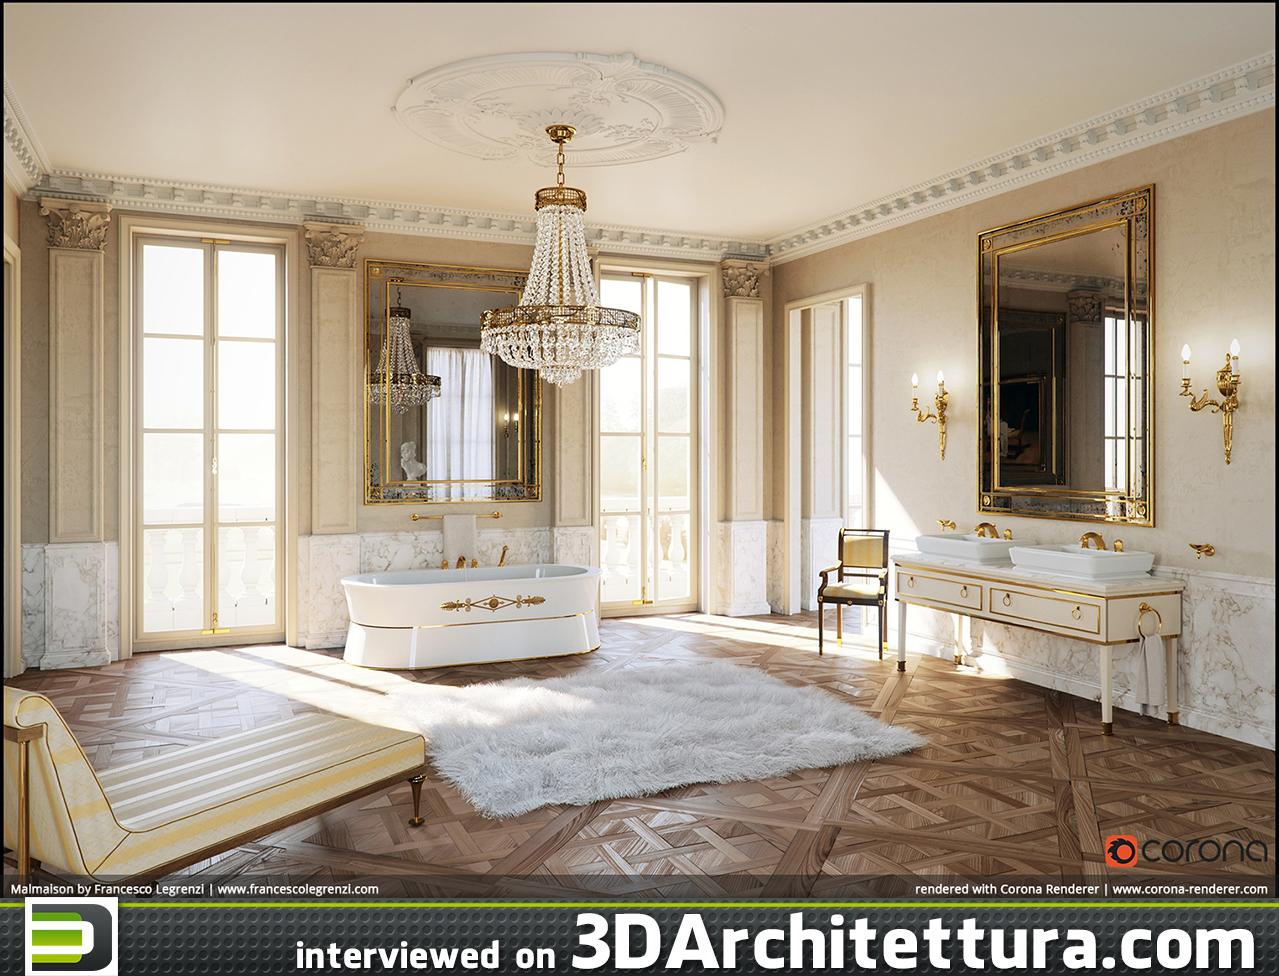 3da_corona_Malmaison-ny-Franceso-Legrenzi